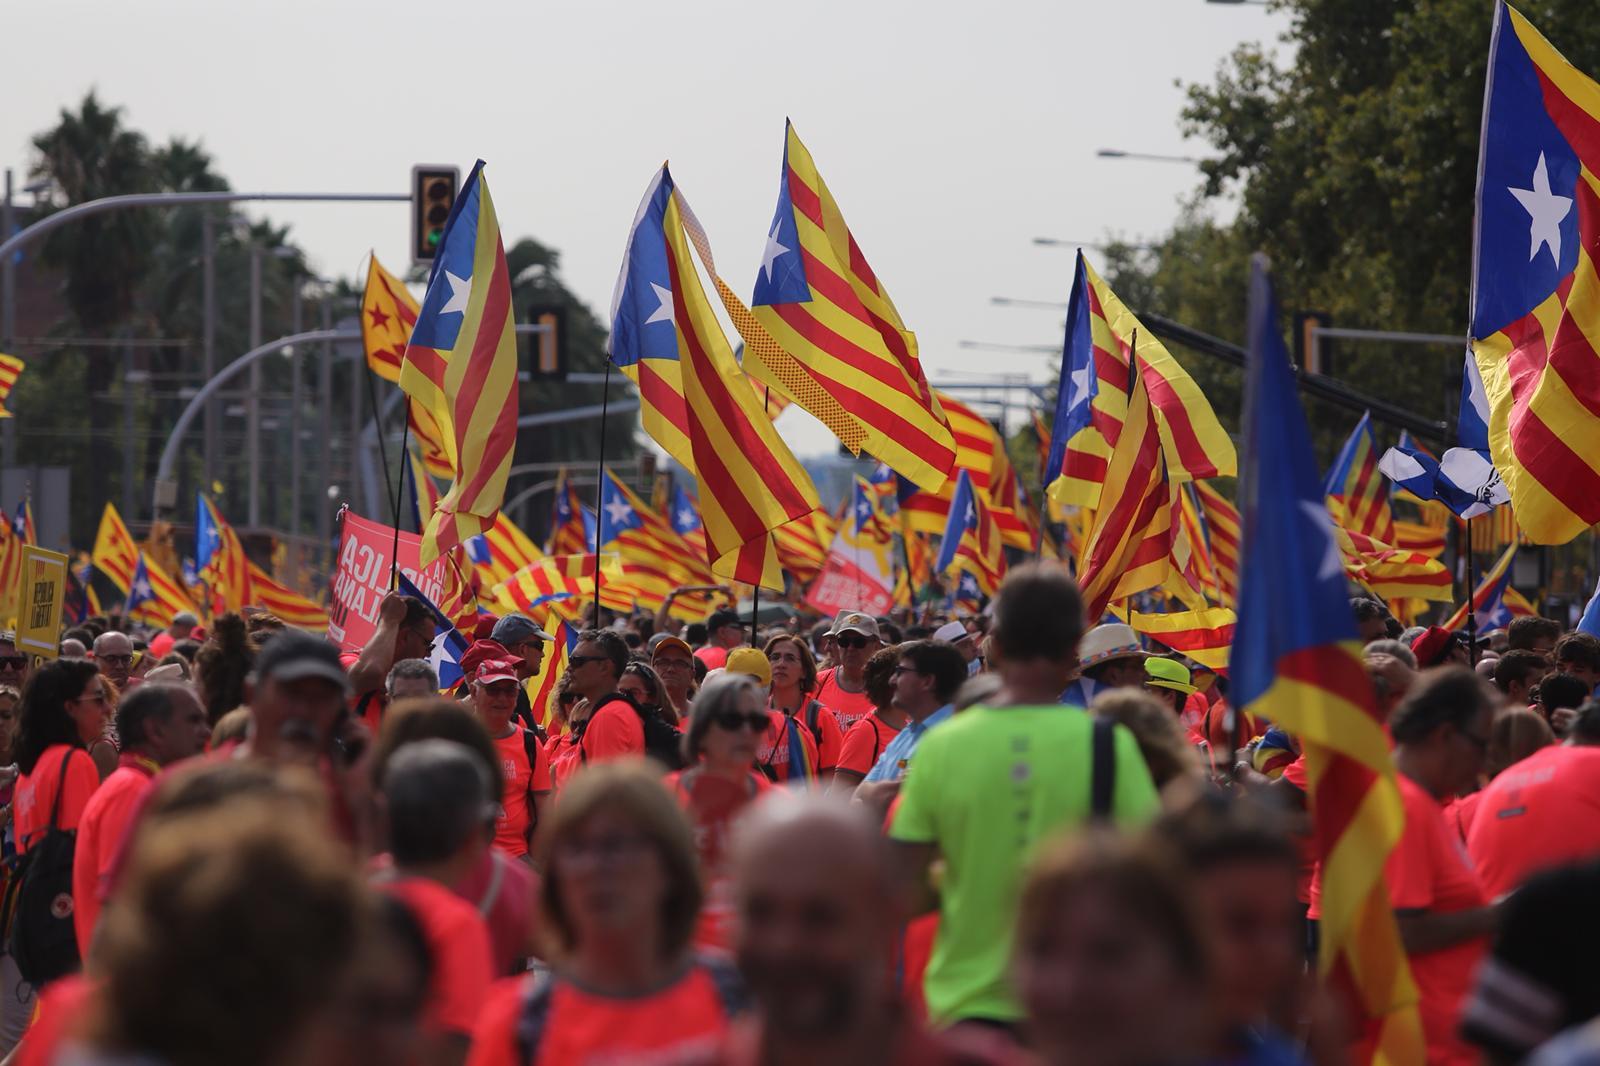 ELNACIONAL manifestacio diada 11 s estelades Carles Palacio